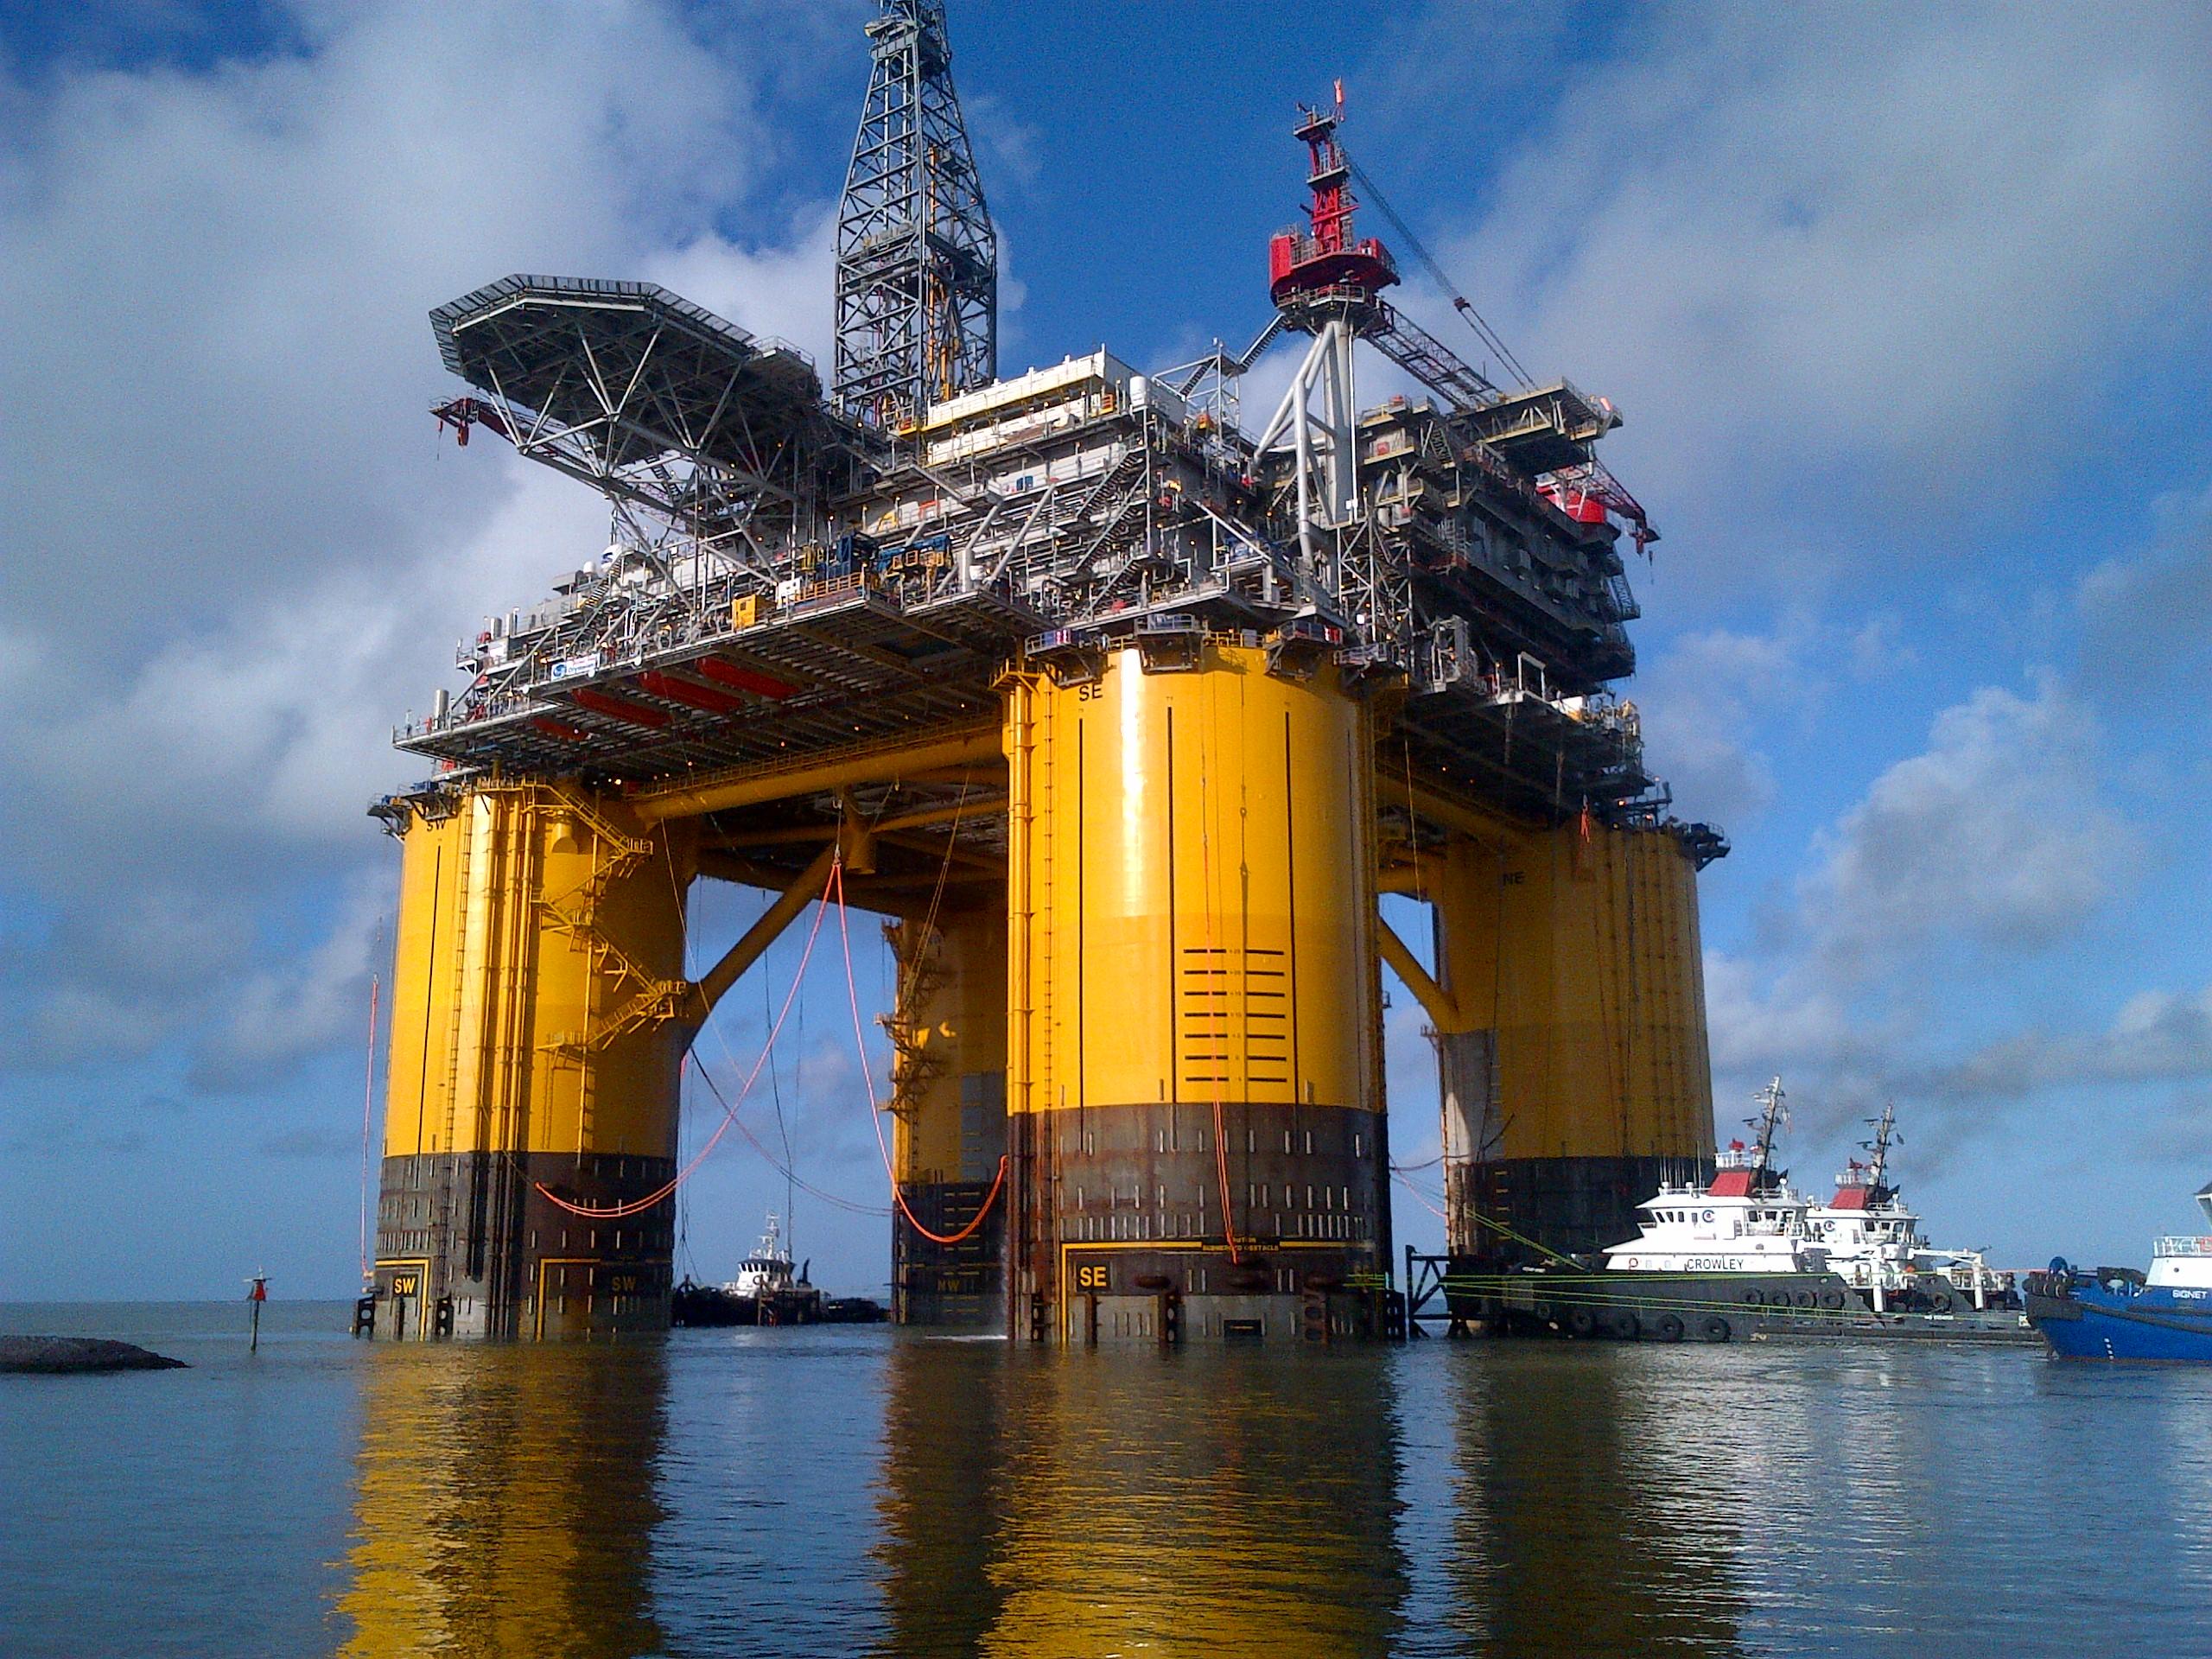 Seahorse, Swordfish and Amberjack: Louisiana pipelines on